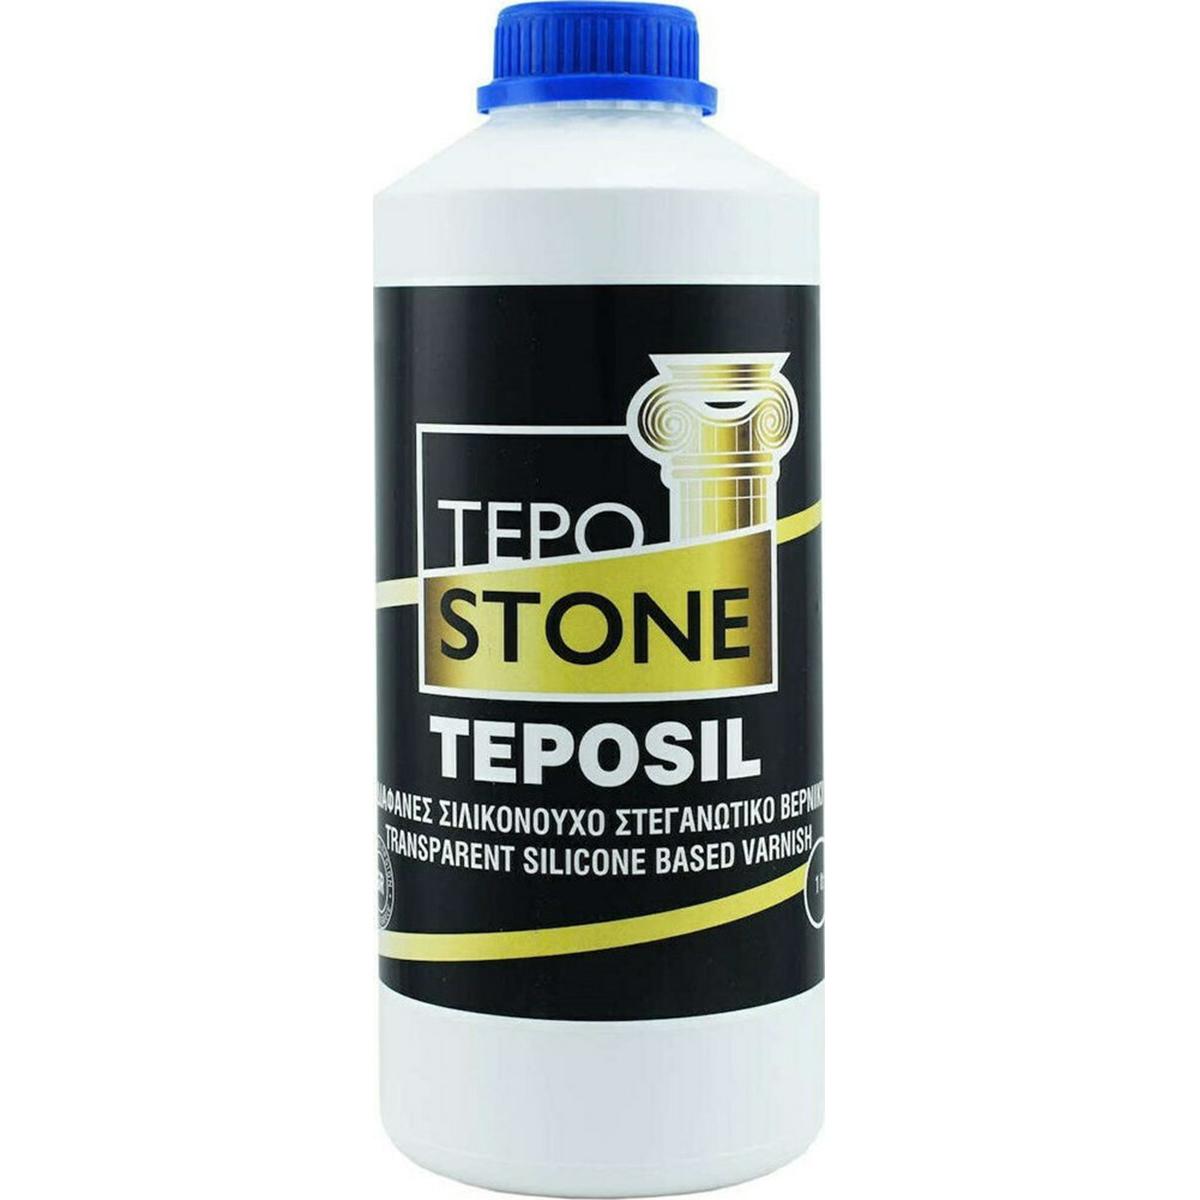 Tepostone Teposil Διαφανές Σιλικονούχο Στεγανωτικό Βερνίκι Ματ 1lt